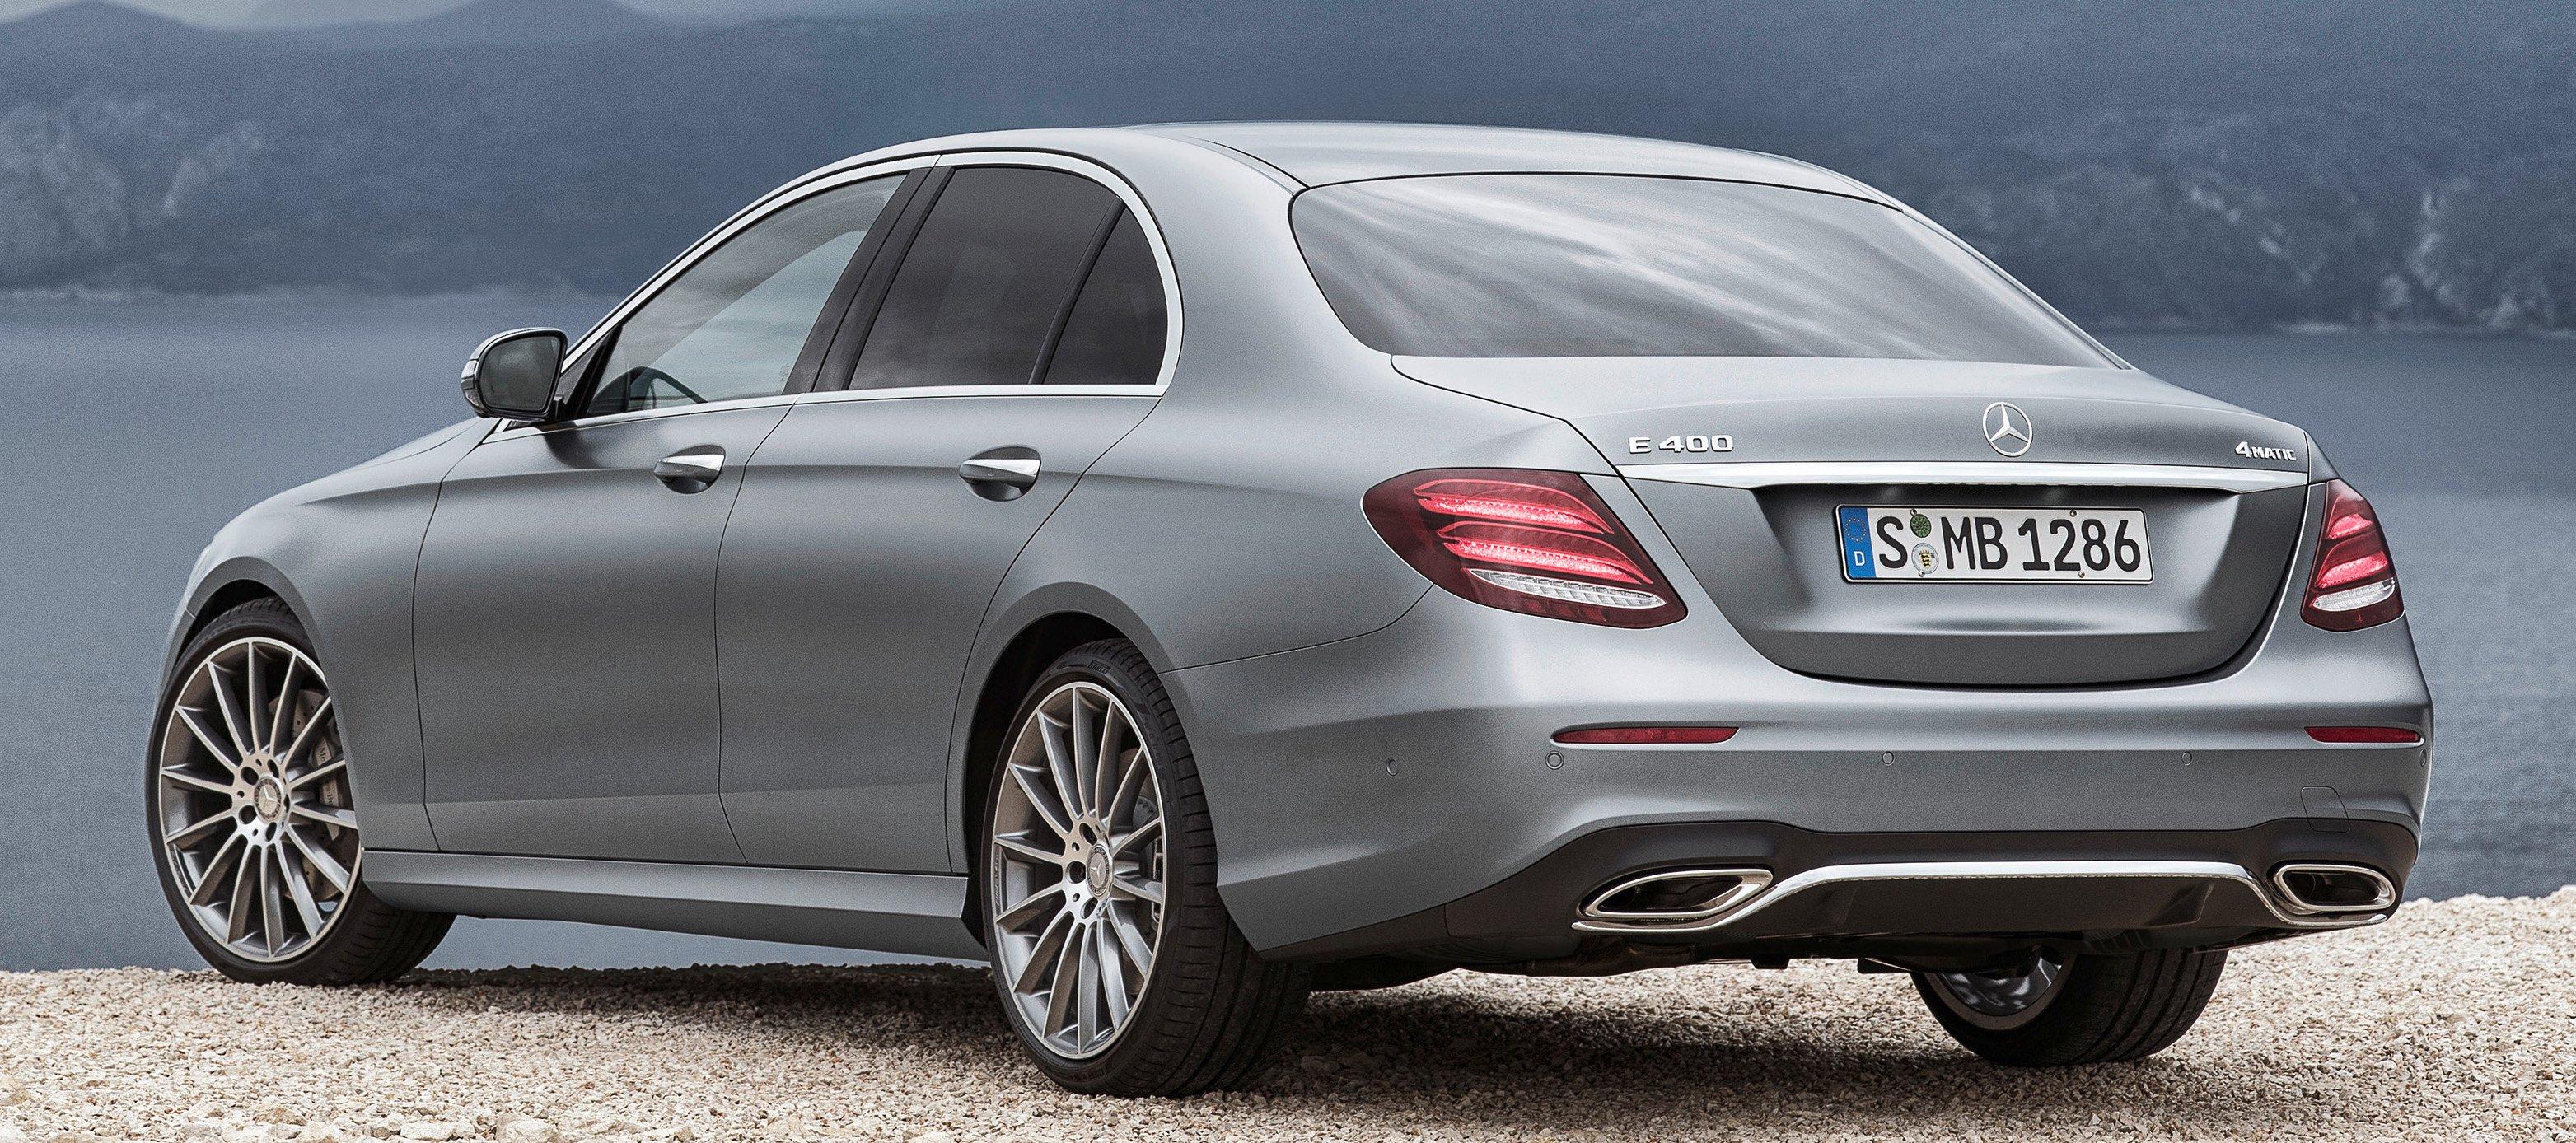 Mercedes Benz S Class  Price In Uae